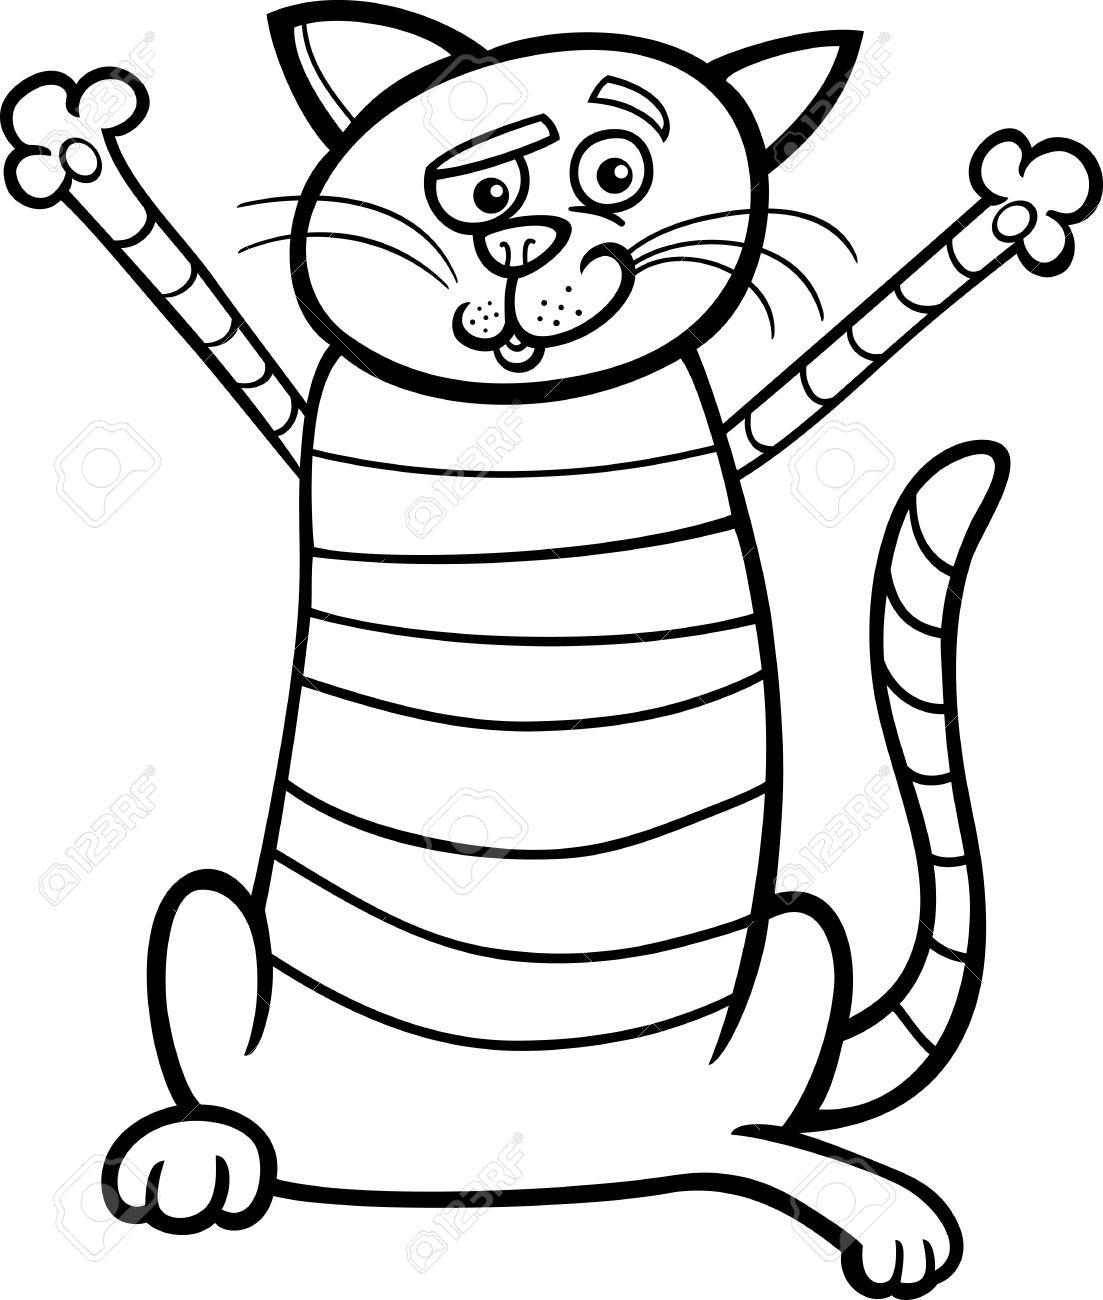 1103x1300 Black And White Cartoon Illustration Of Happy Tabby Cat